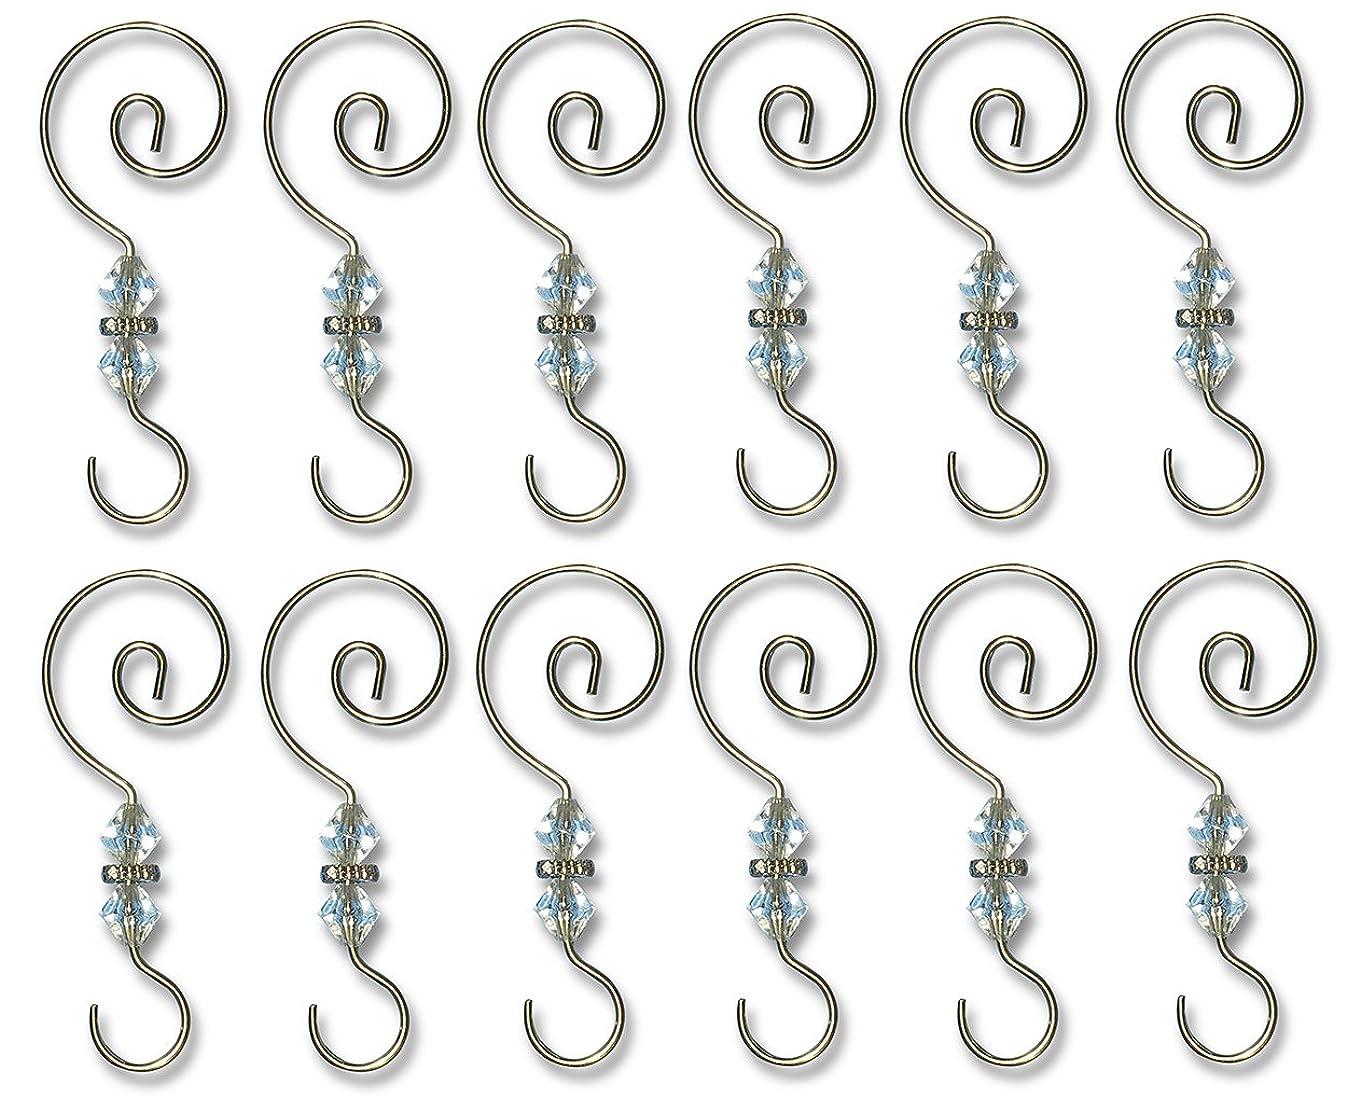 BANBERRY DESIGNS Christmas Ornament Hooks - 12 Pack - Decorative Christmas Tree Ornament Hangers